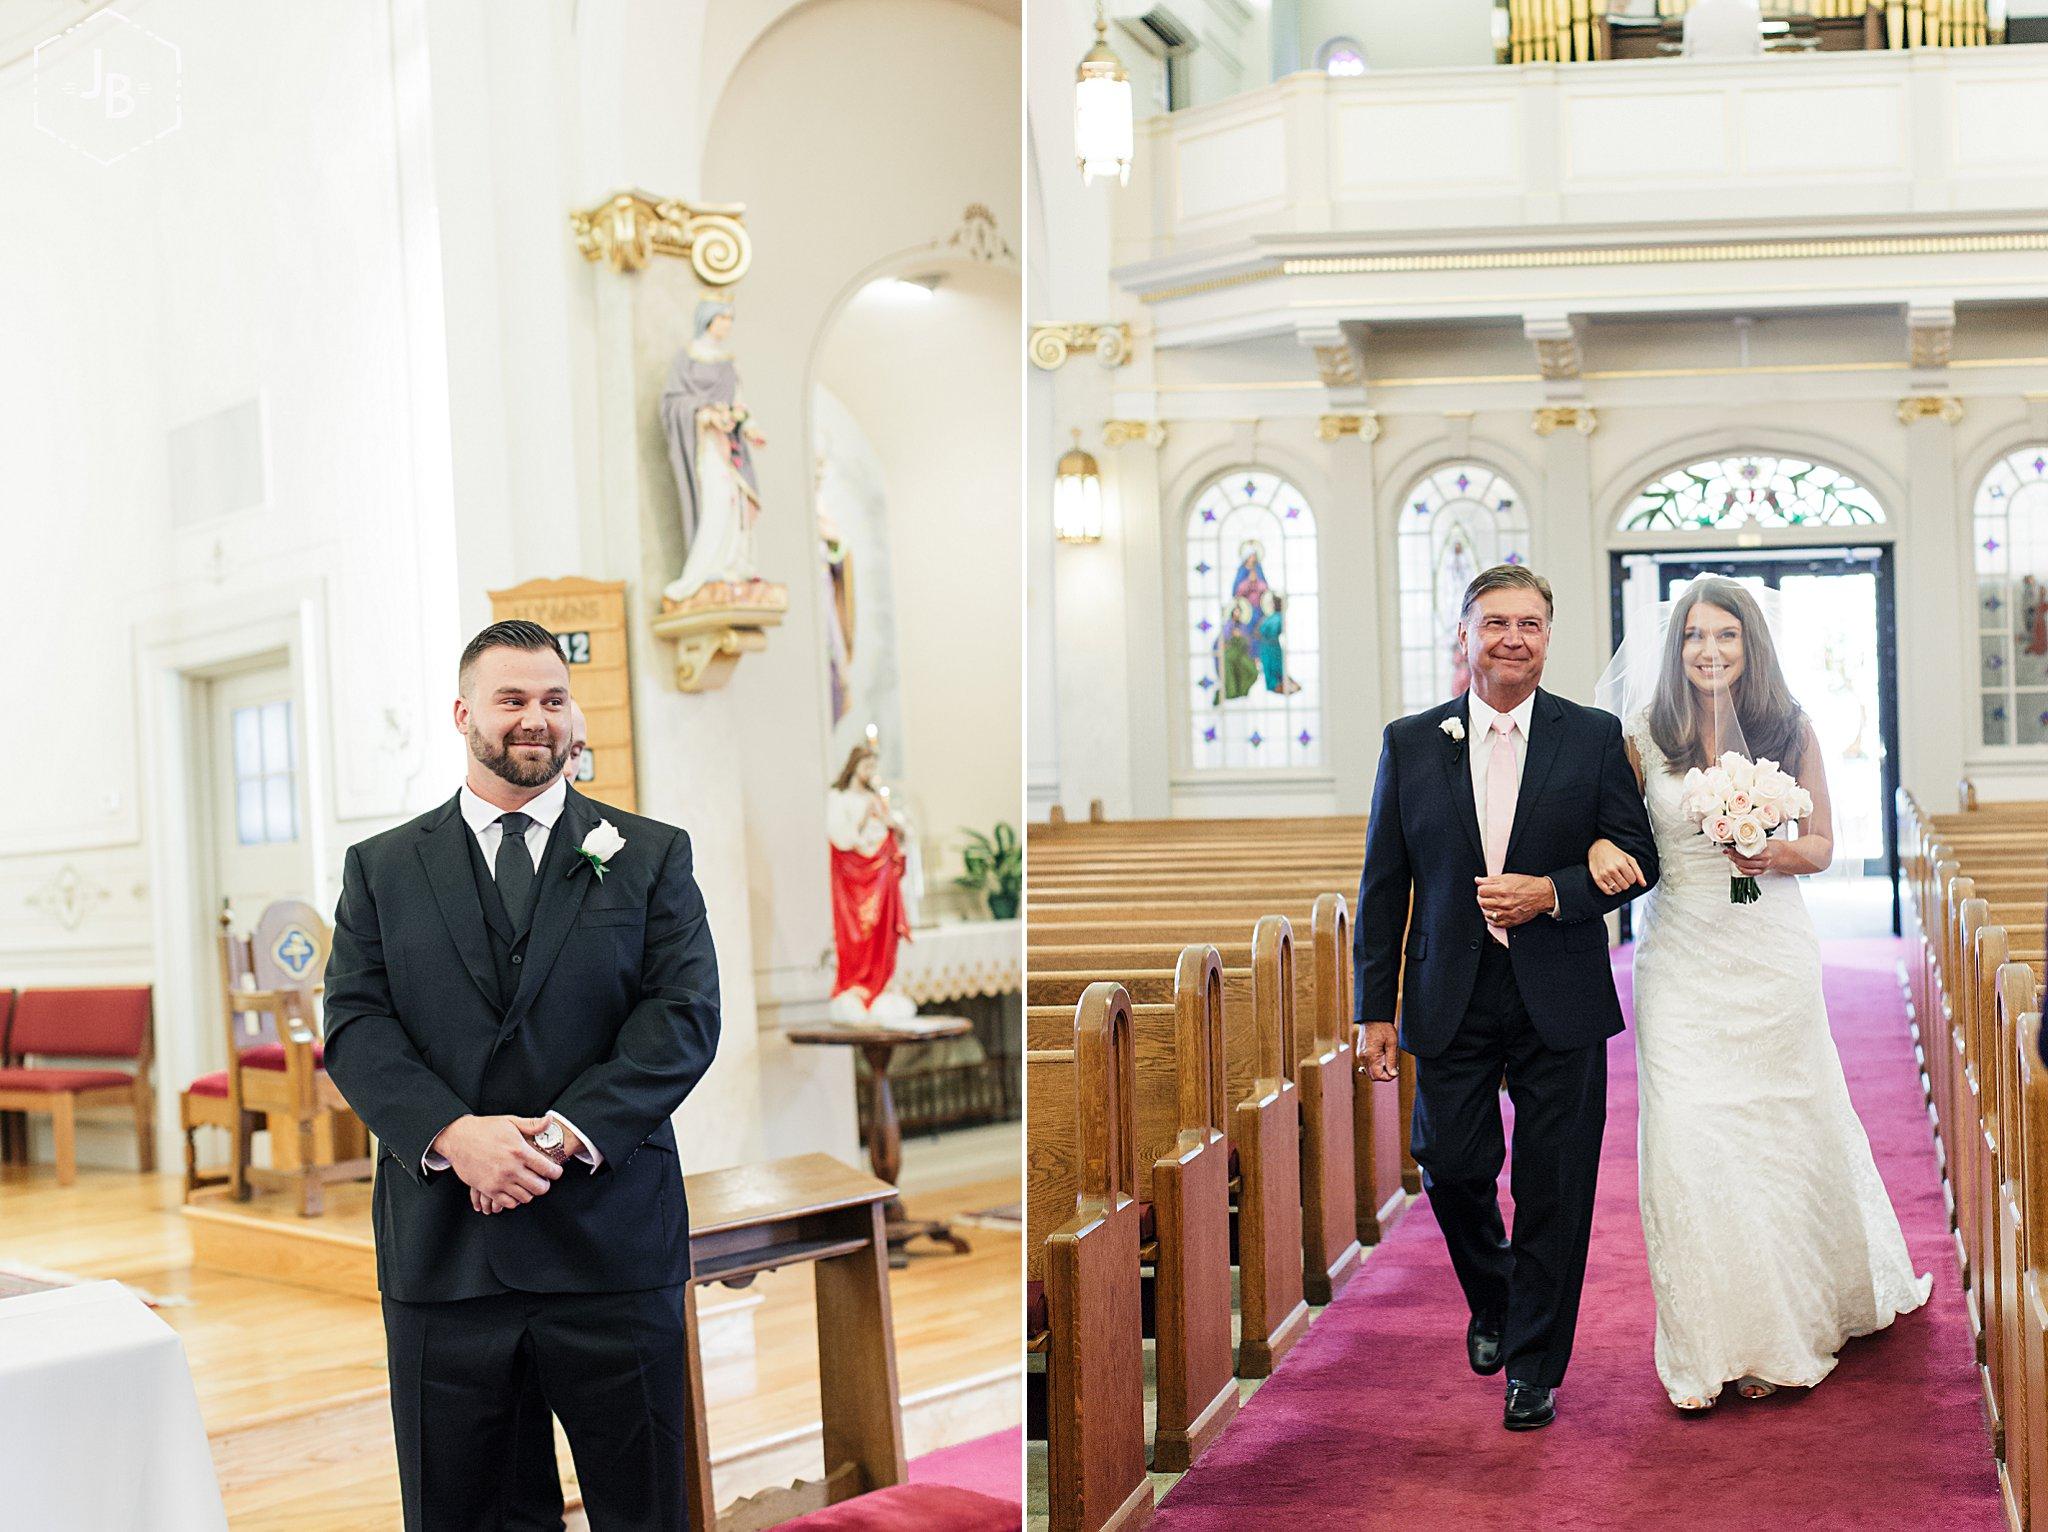 WeddingandEngagementFloridaPhotographer_2907.jpg